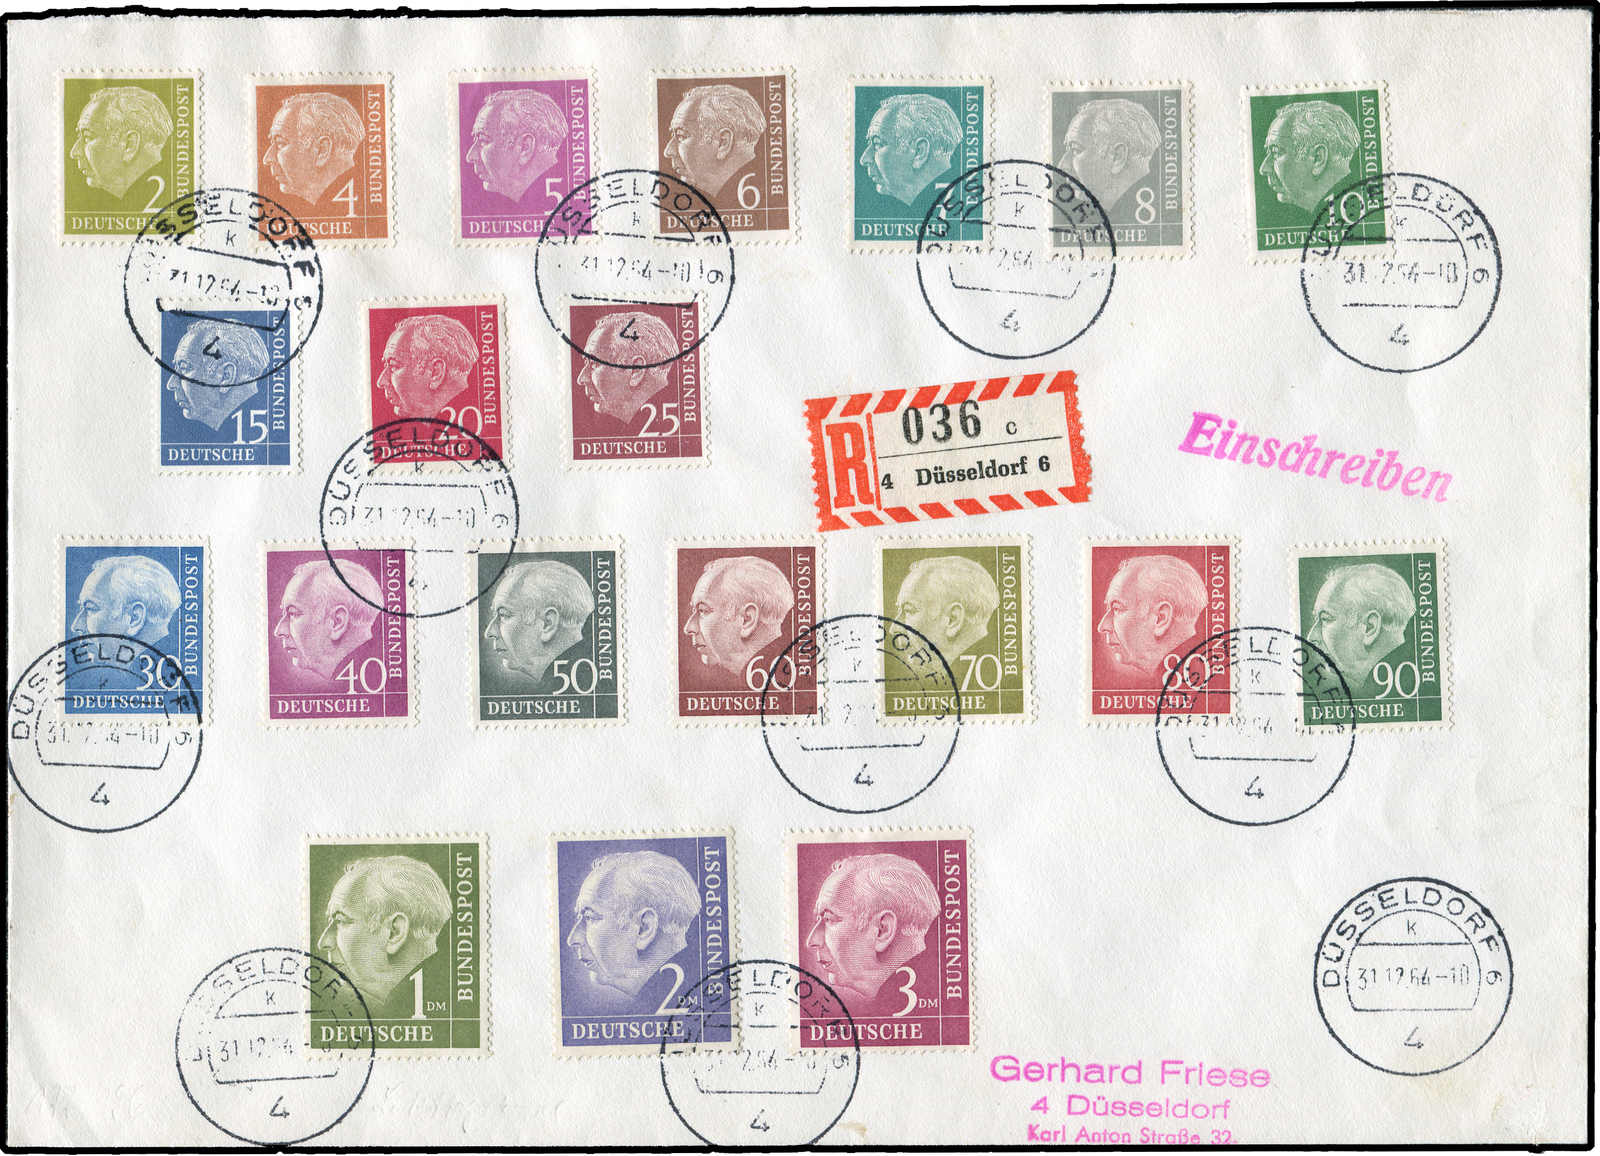 Lot 8439 - federal republic of germany bundesrepublik deutschland -  Auktionshaus Schlegel 26 Public Auction